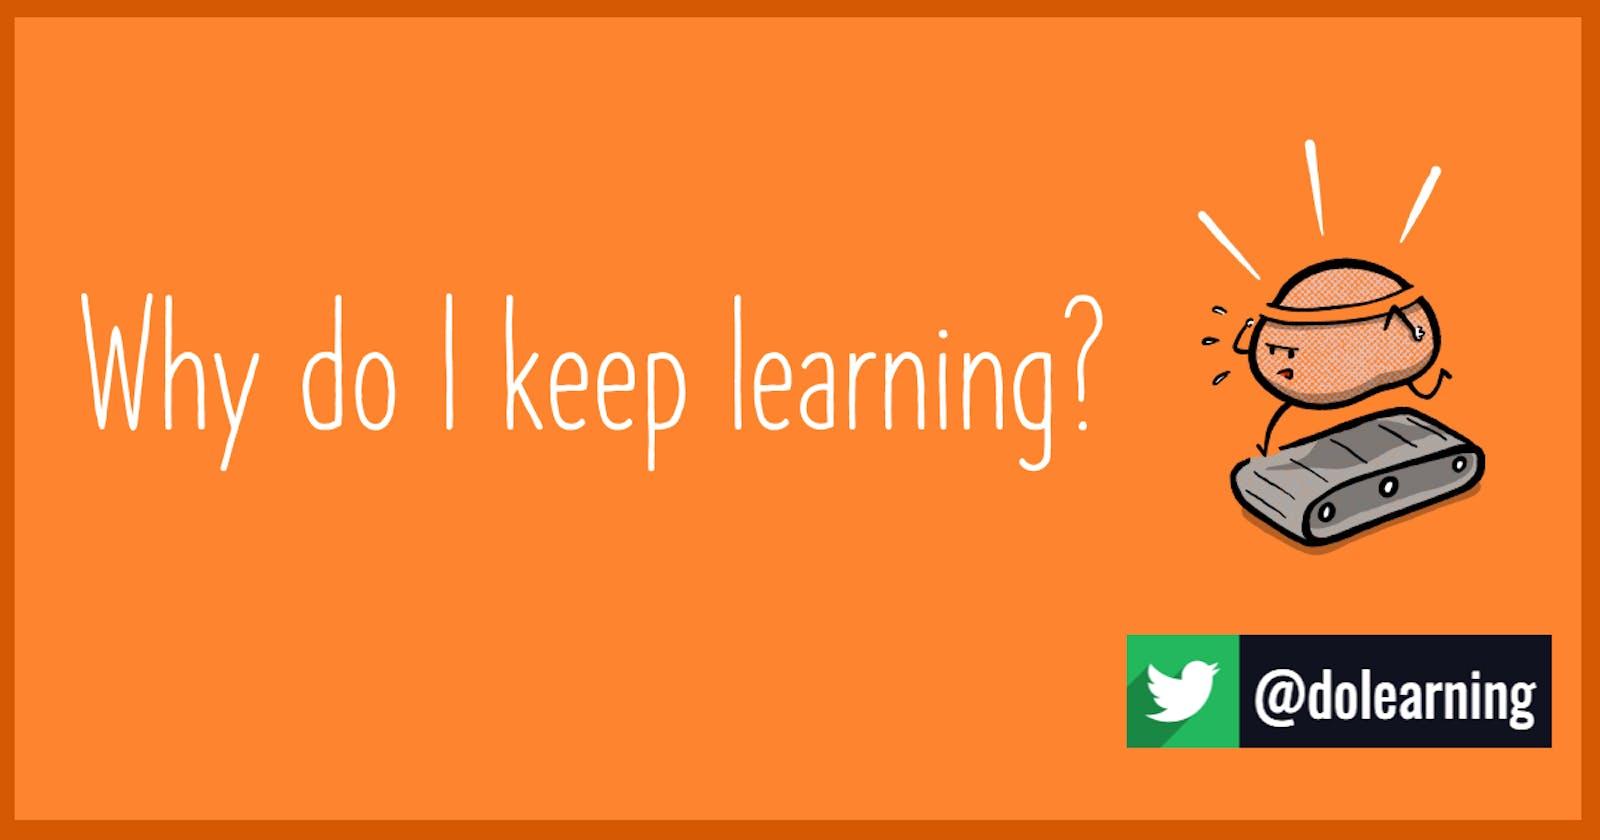 Why do I keep learning?